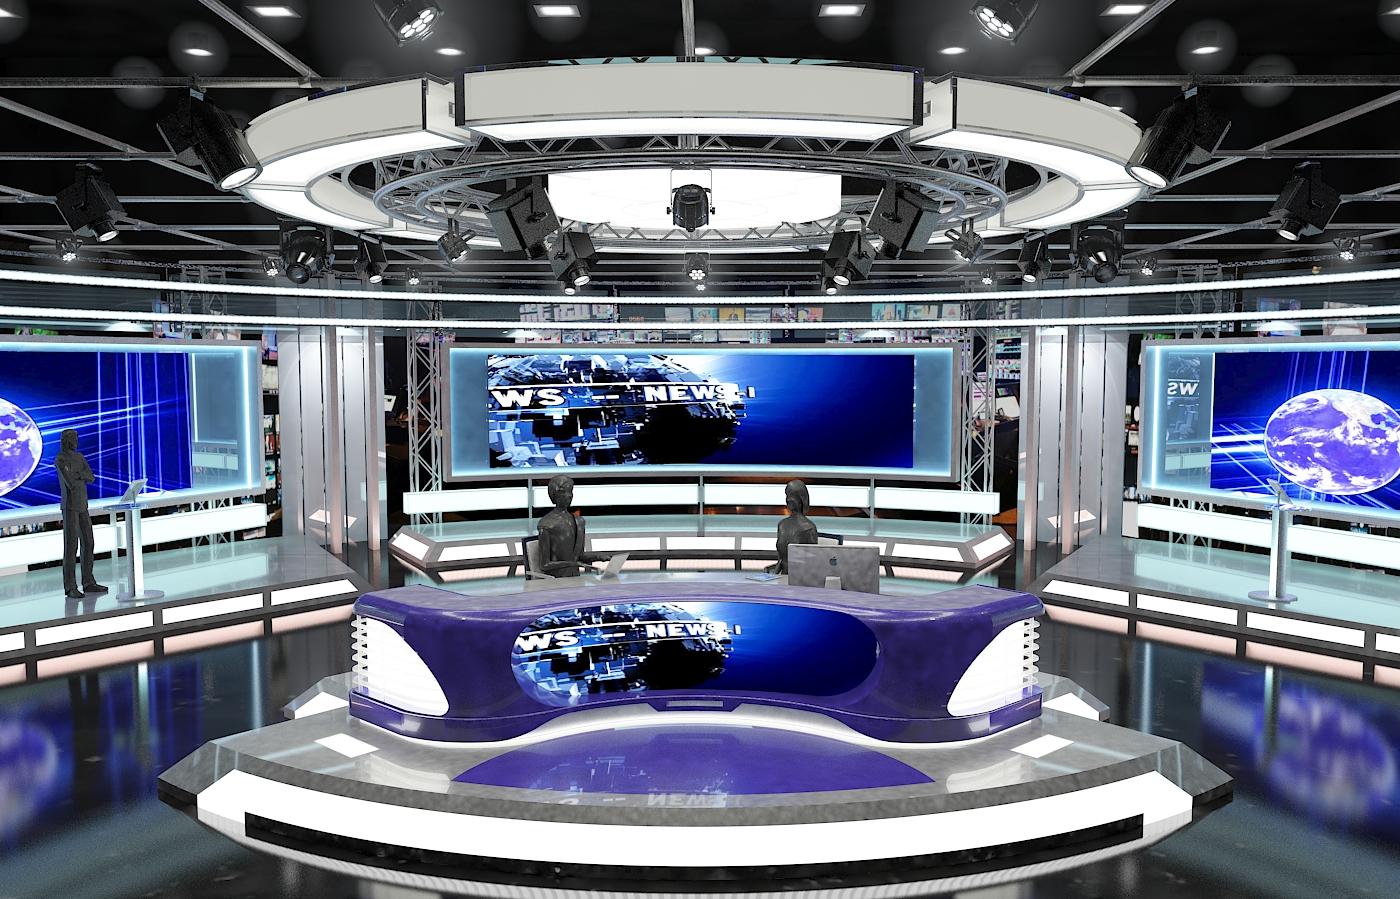 виртуал телевизийн студи цуглуулга vol 6 3d загвар max dxf dwg fbx obj 223362